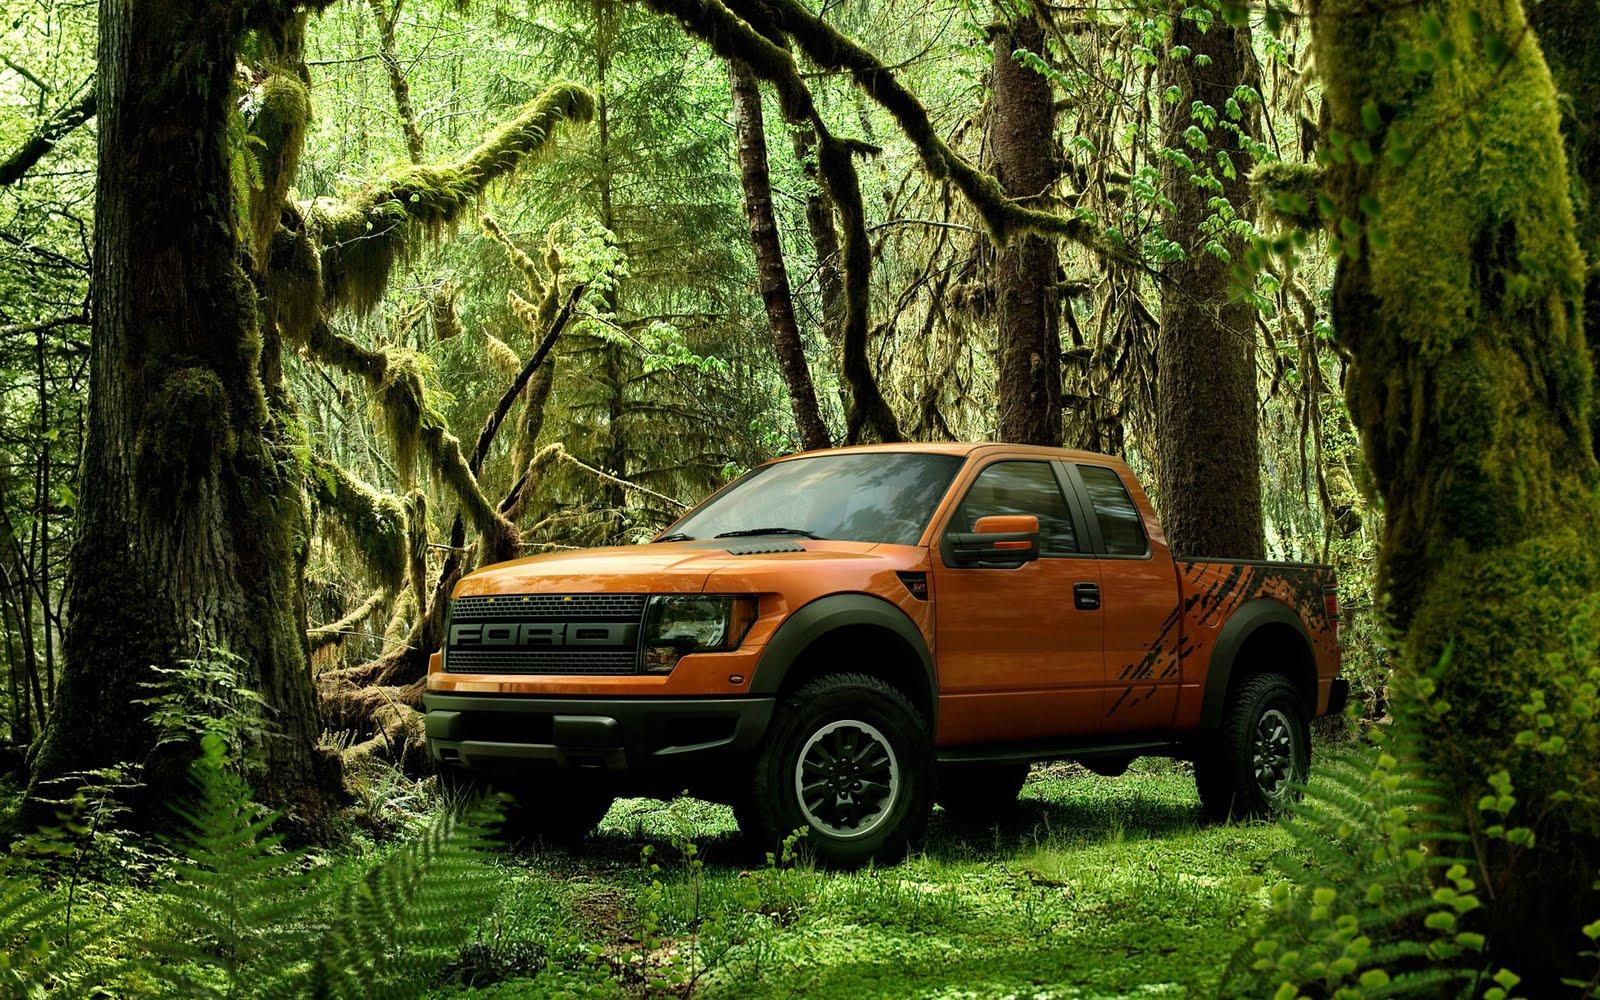 Ford F 150 SVT Raptor Hd Desktop Wallpaper 1600x1000